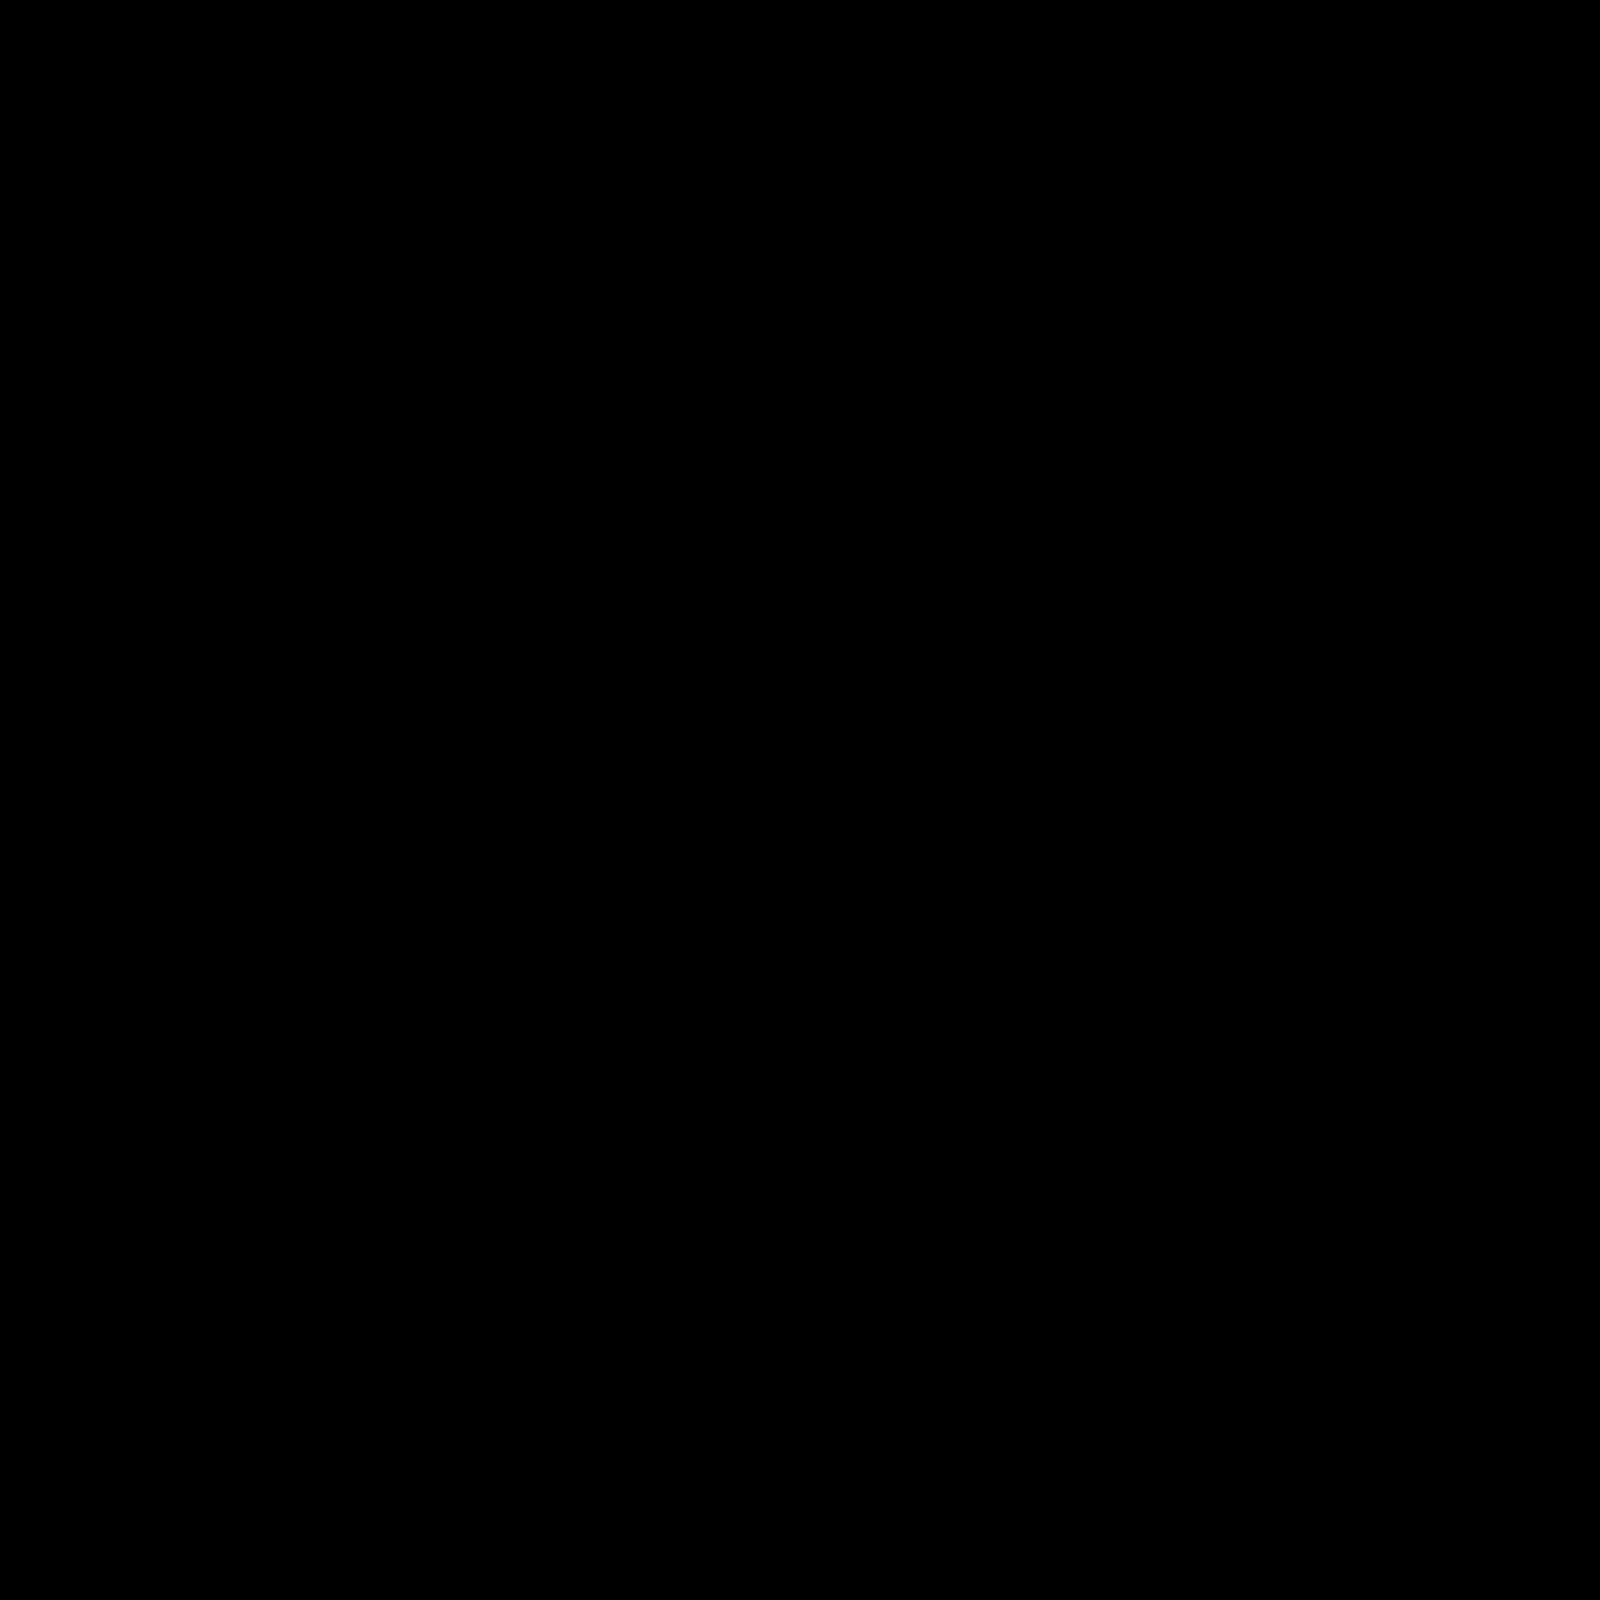 Laktator manualny icon